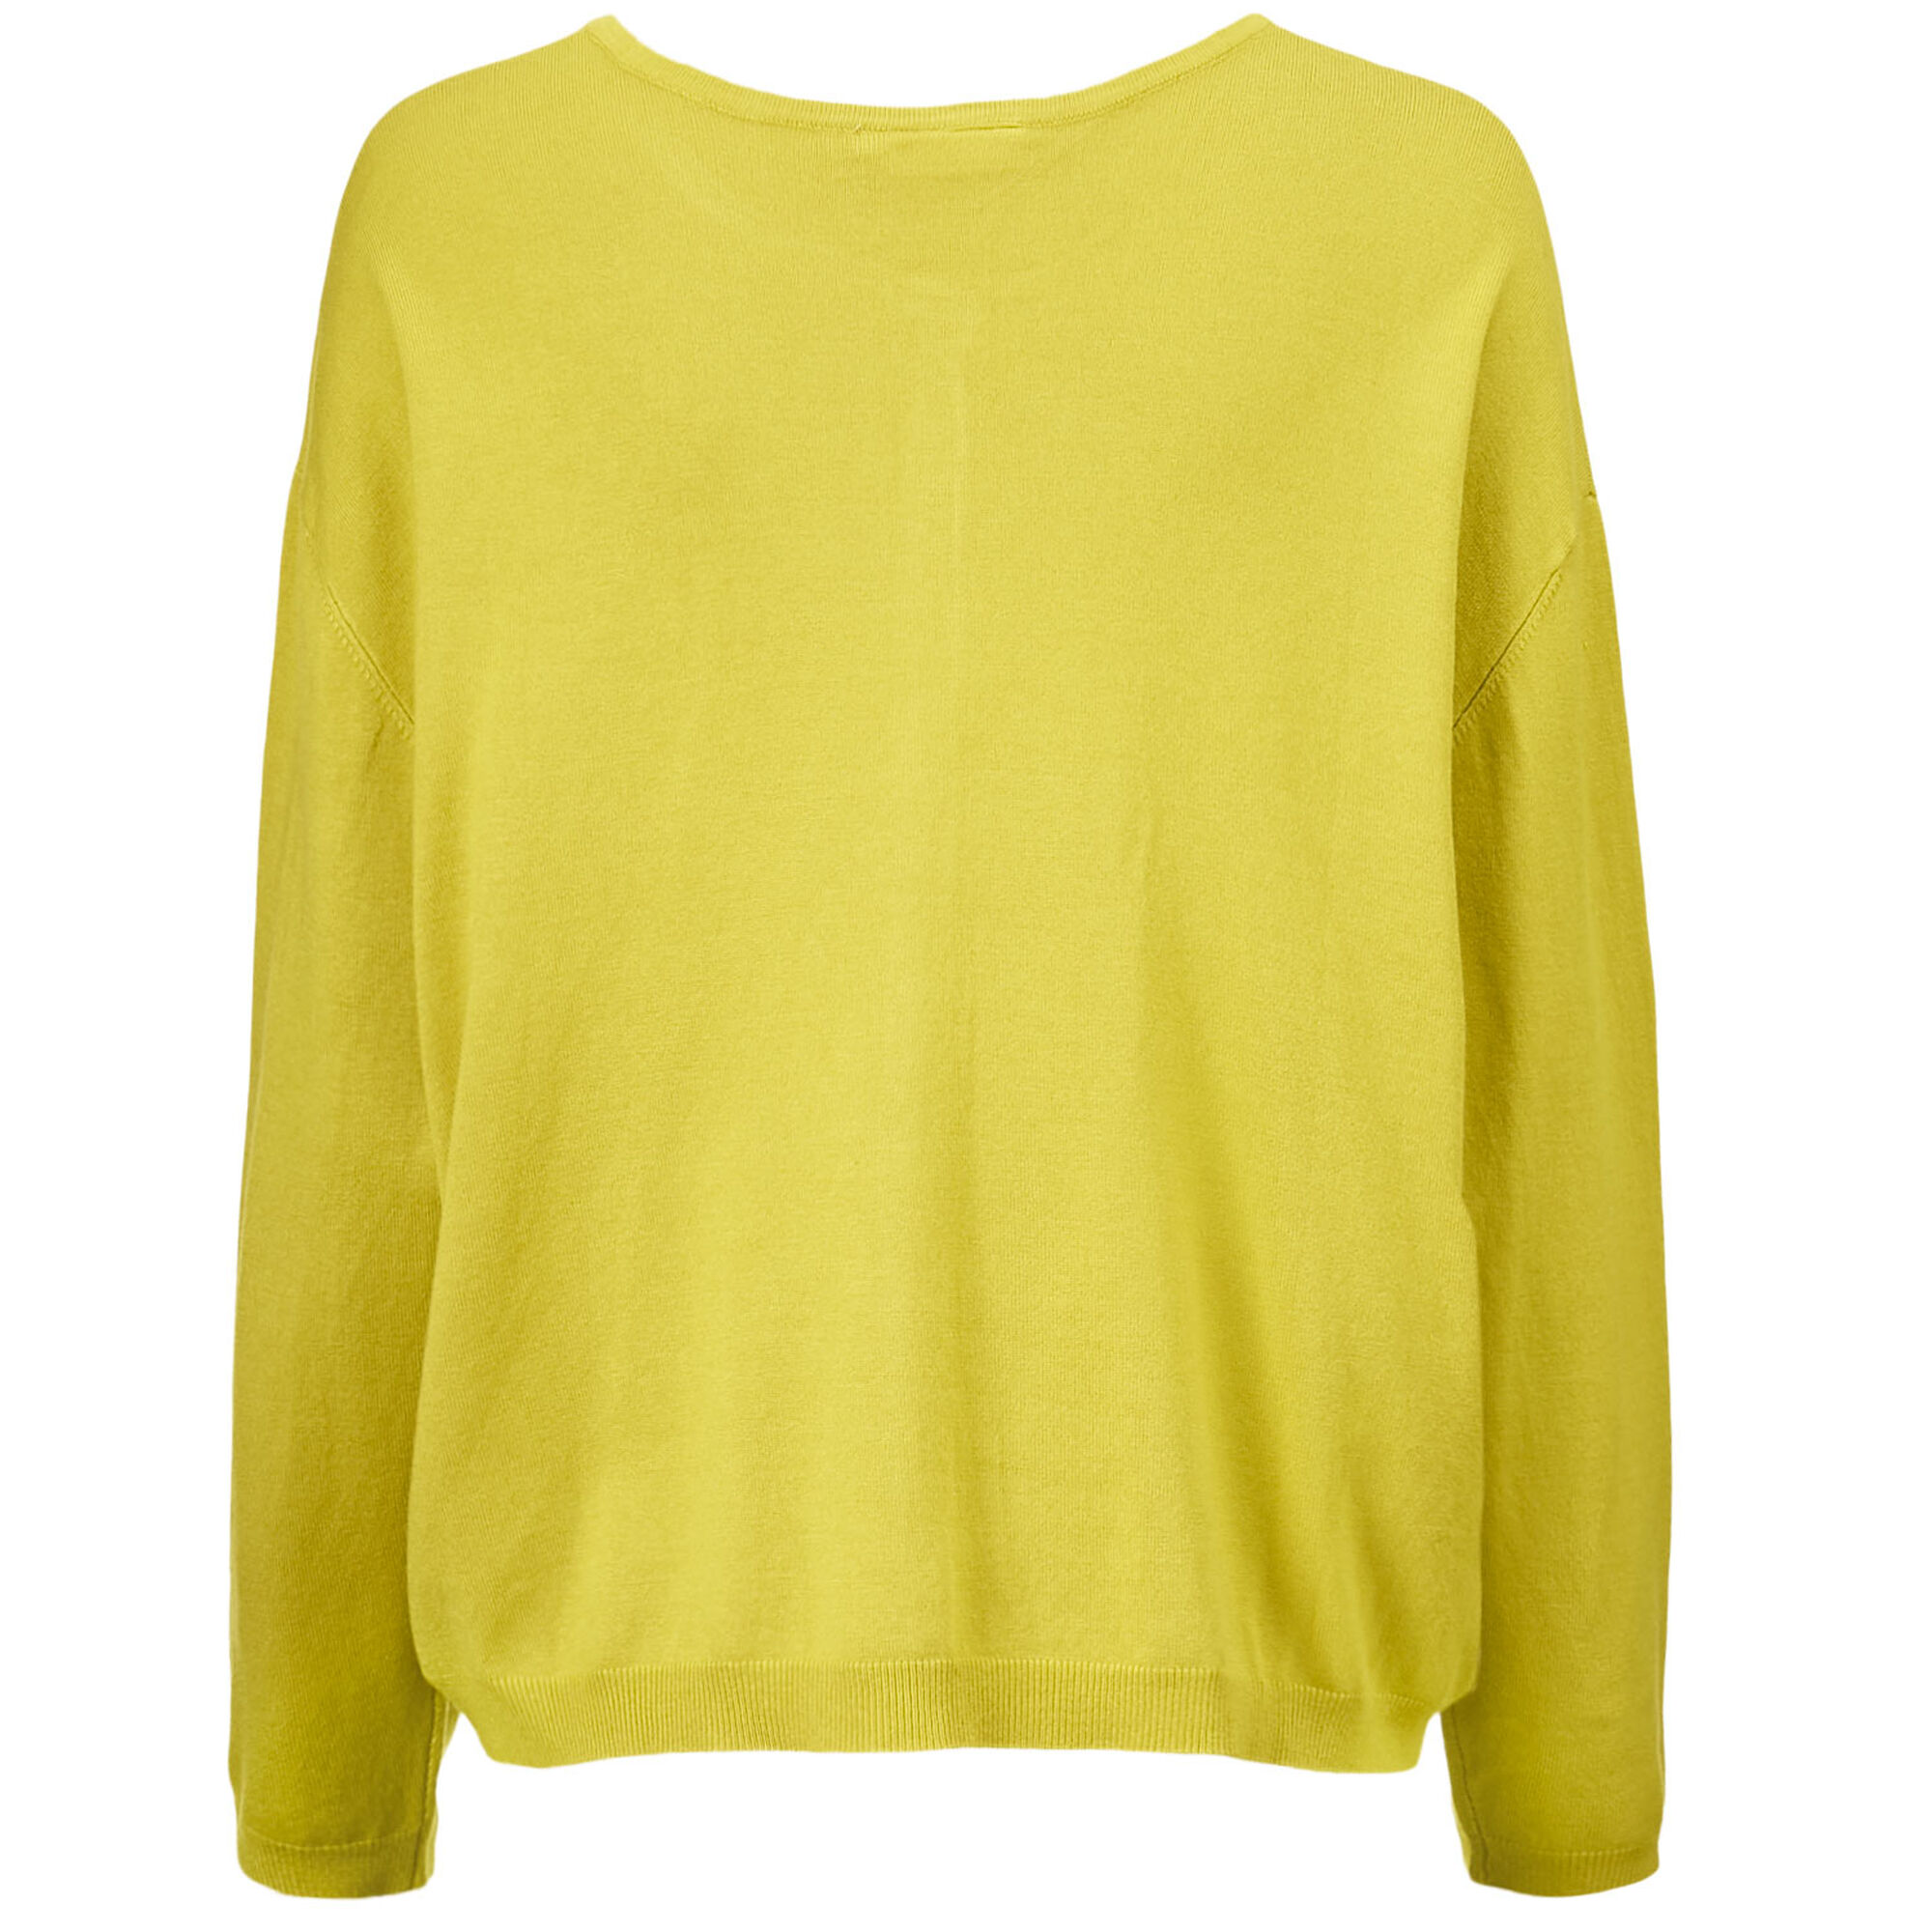 LENKA CARDIGAN, Oil Yellow, hi-res